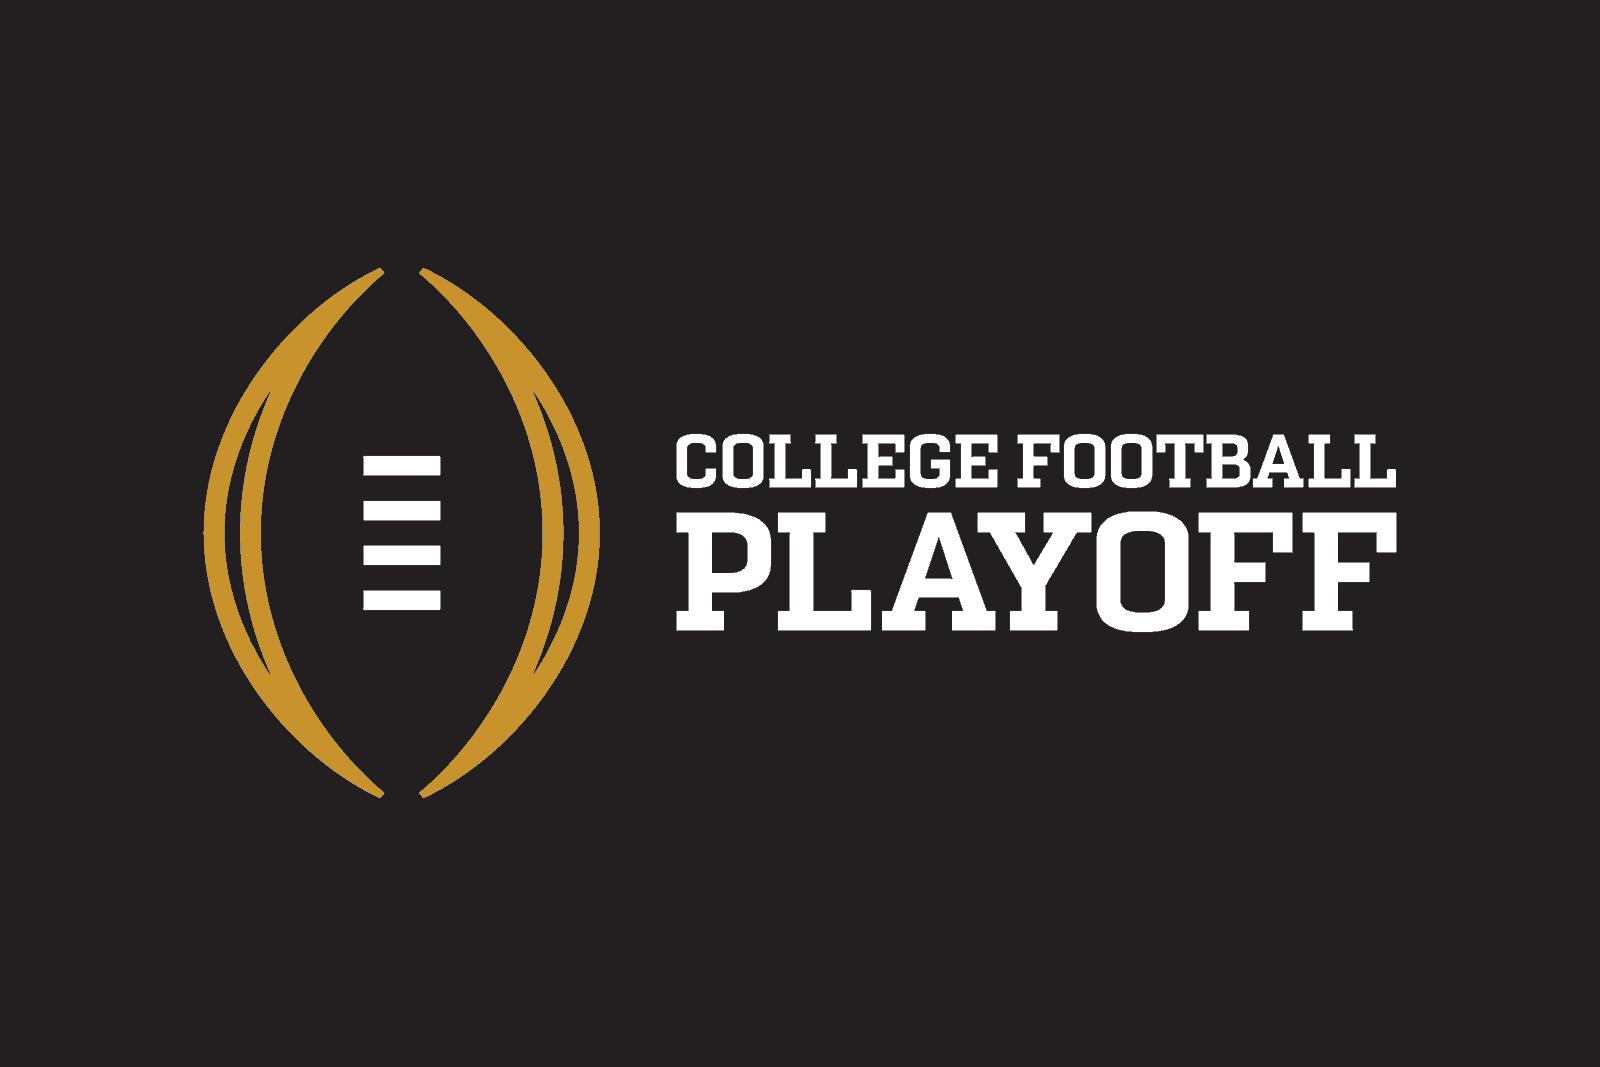 College Football Playoffs